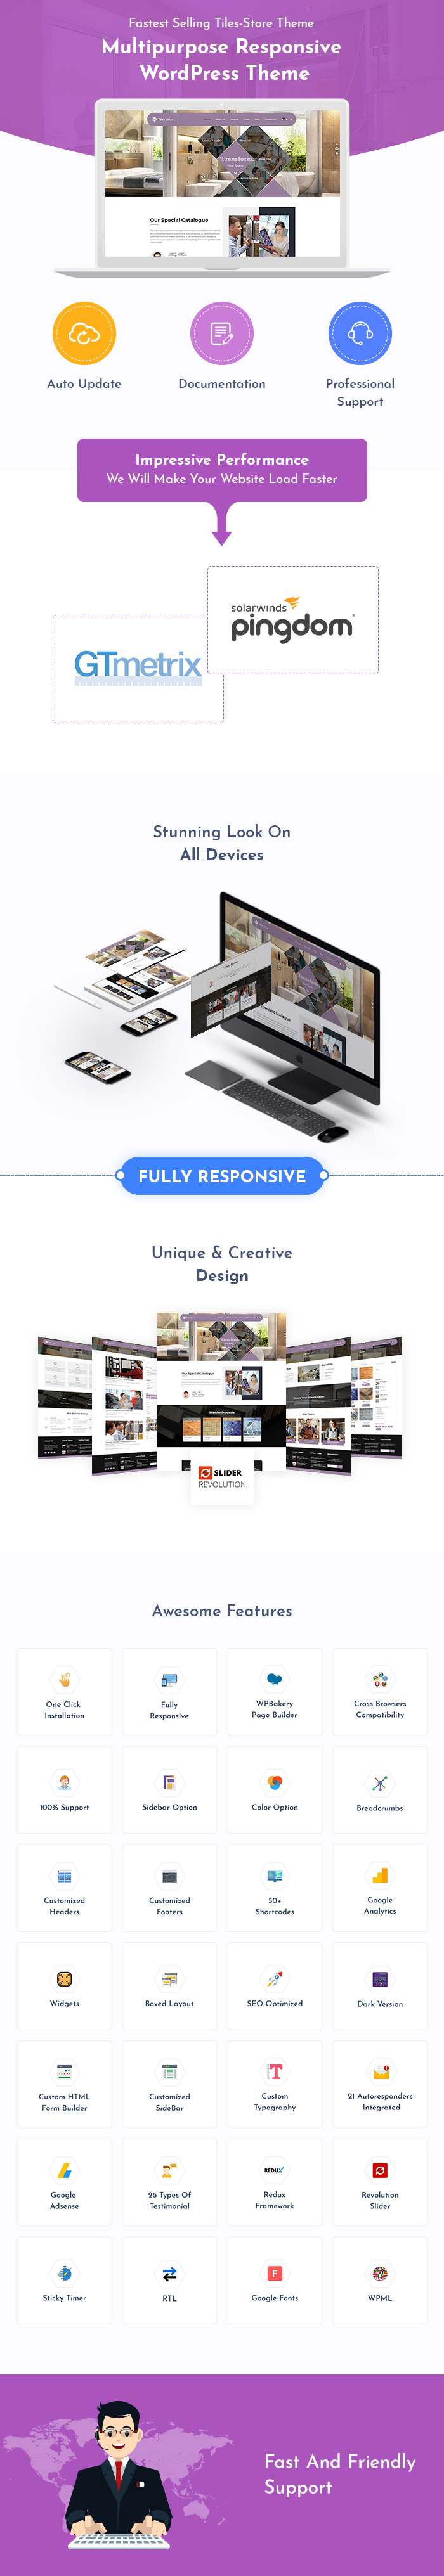 Tiles Store WordPress Themes